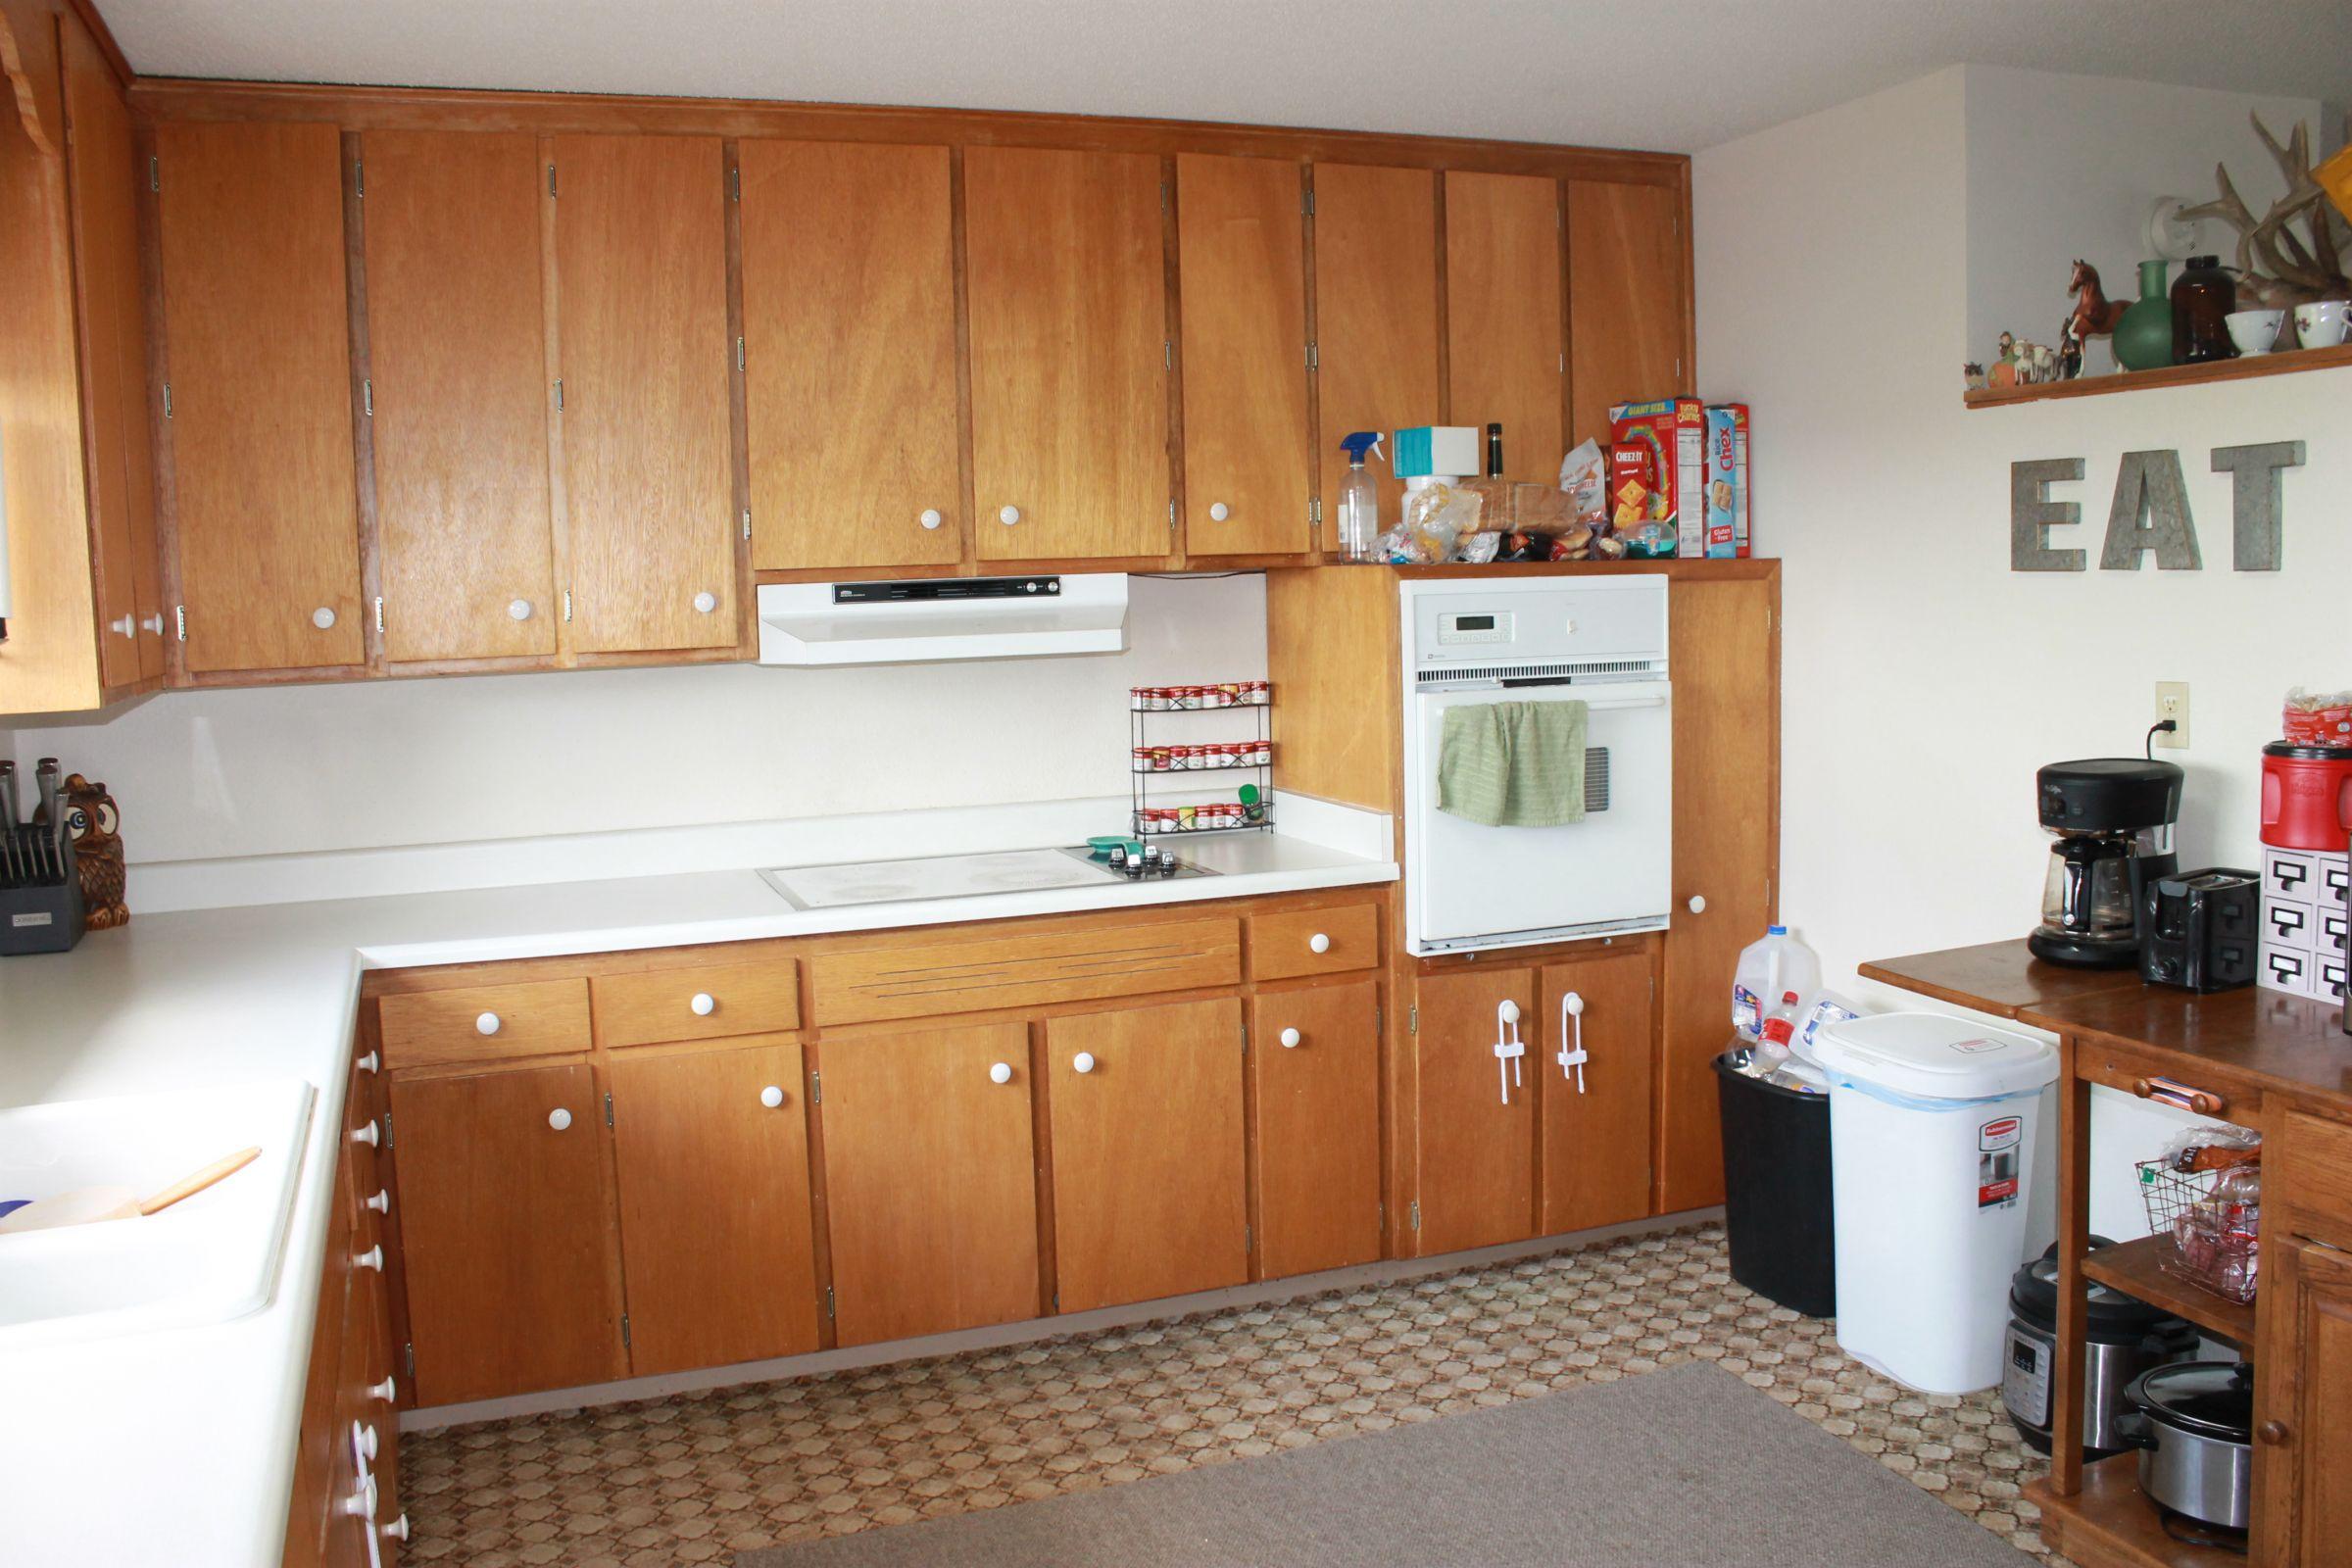 residential-development-land-warren-county-iowa-38-acres-listing-number-15513-3-2021-05-06-210433.JPG